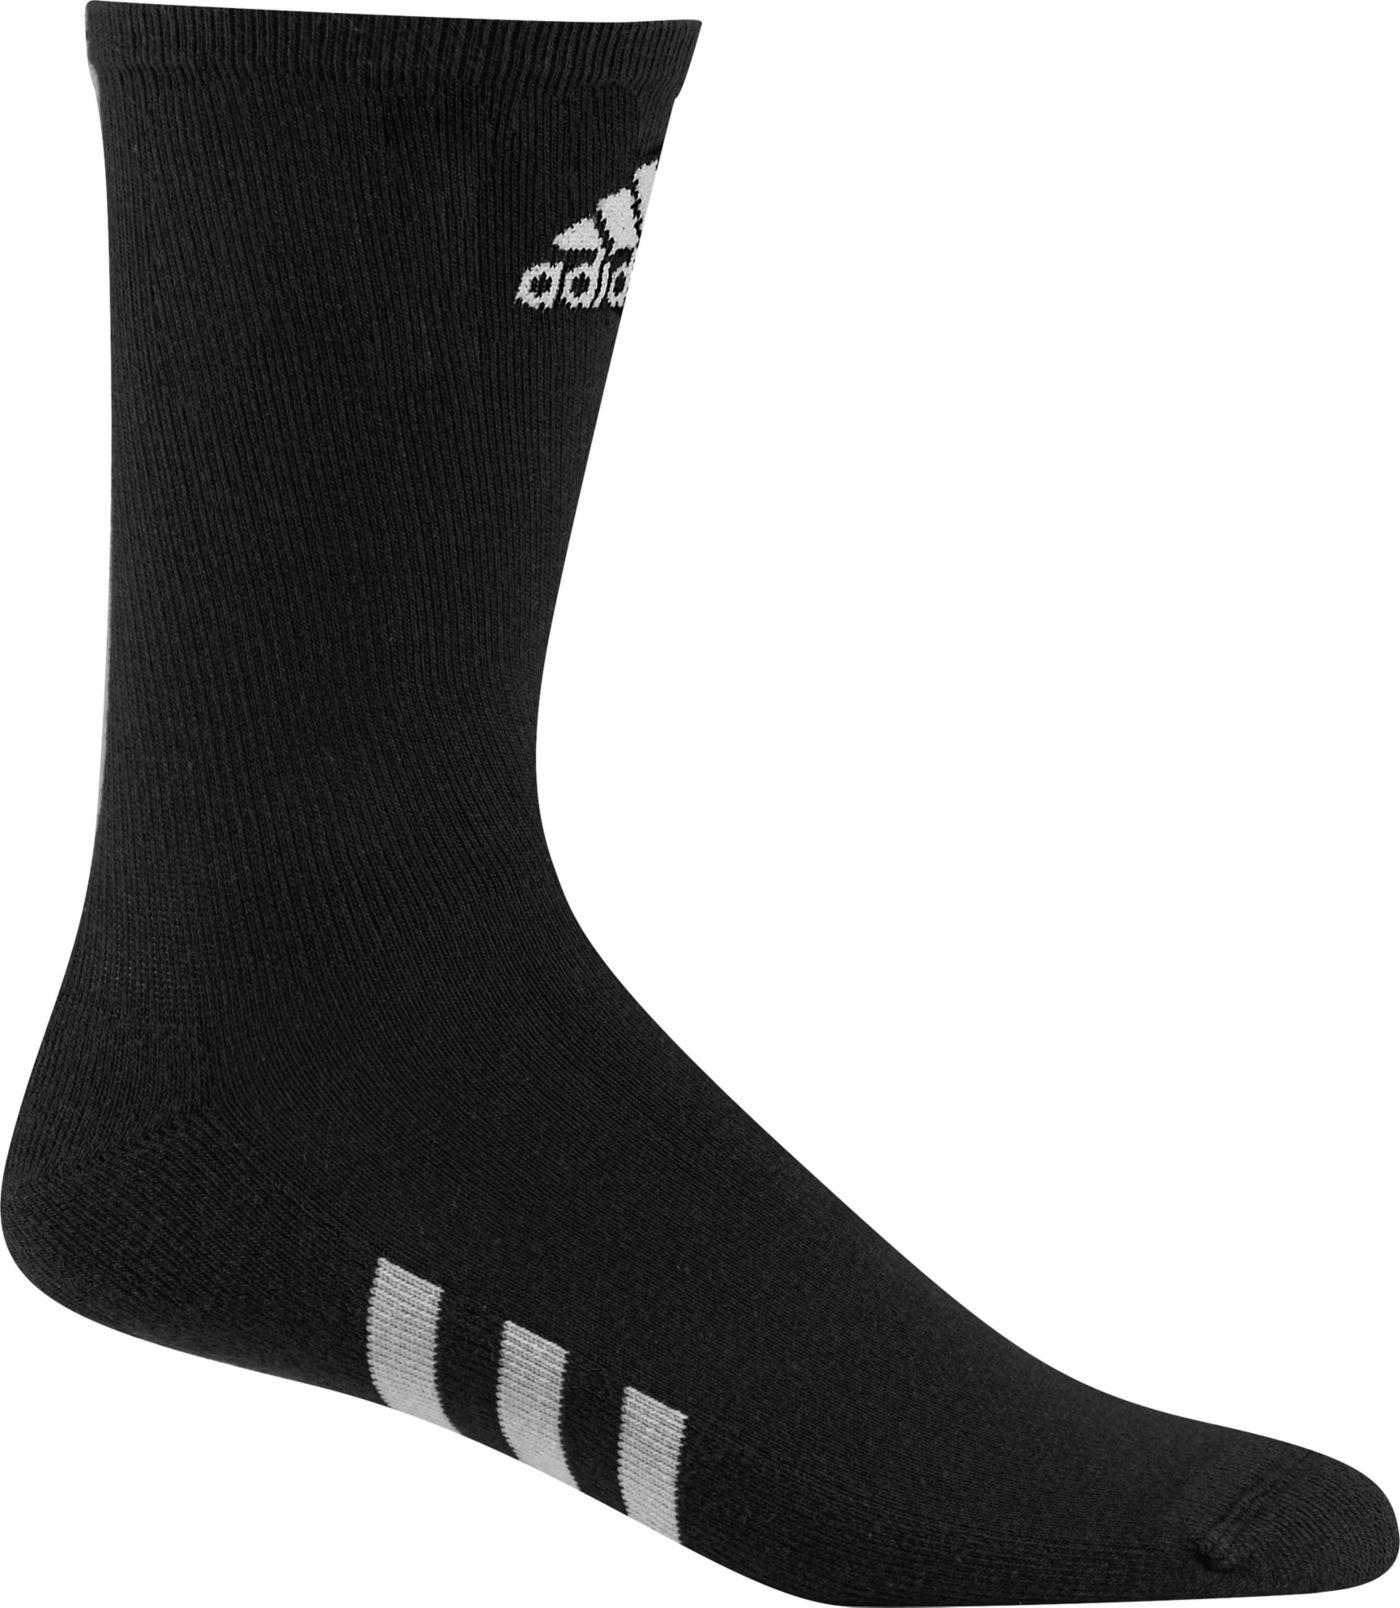 adidas Men's Crew Golf Socks – 3 pack